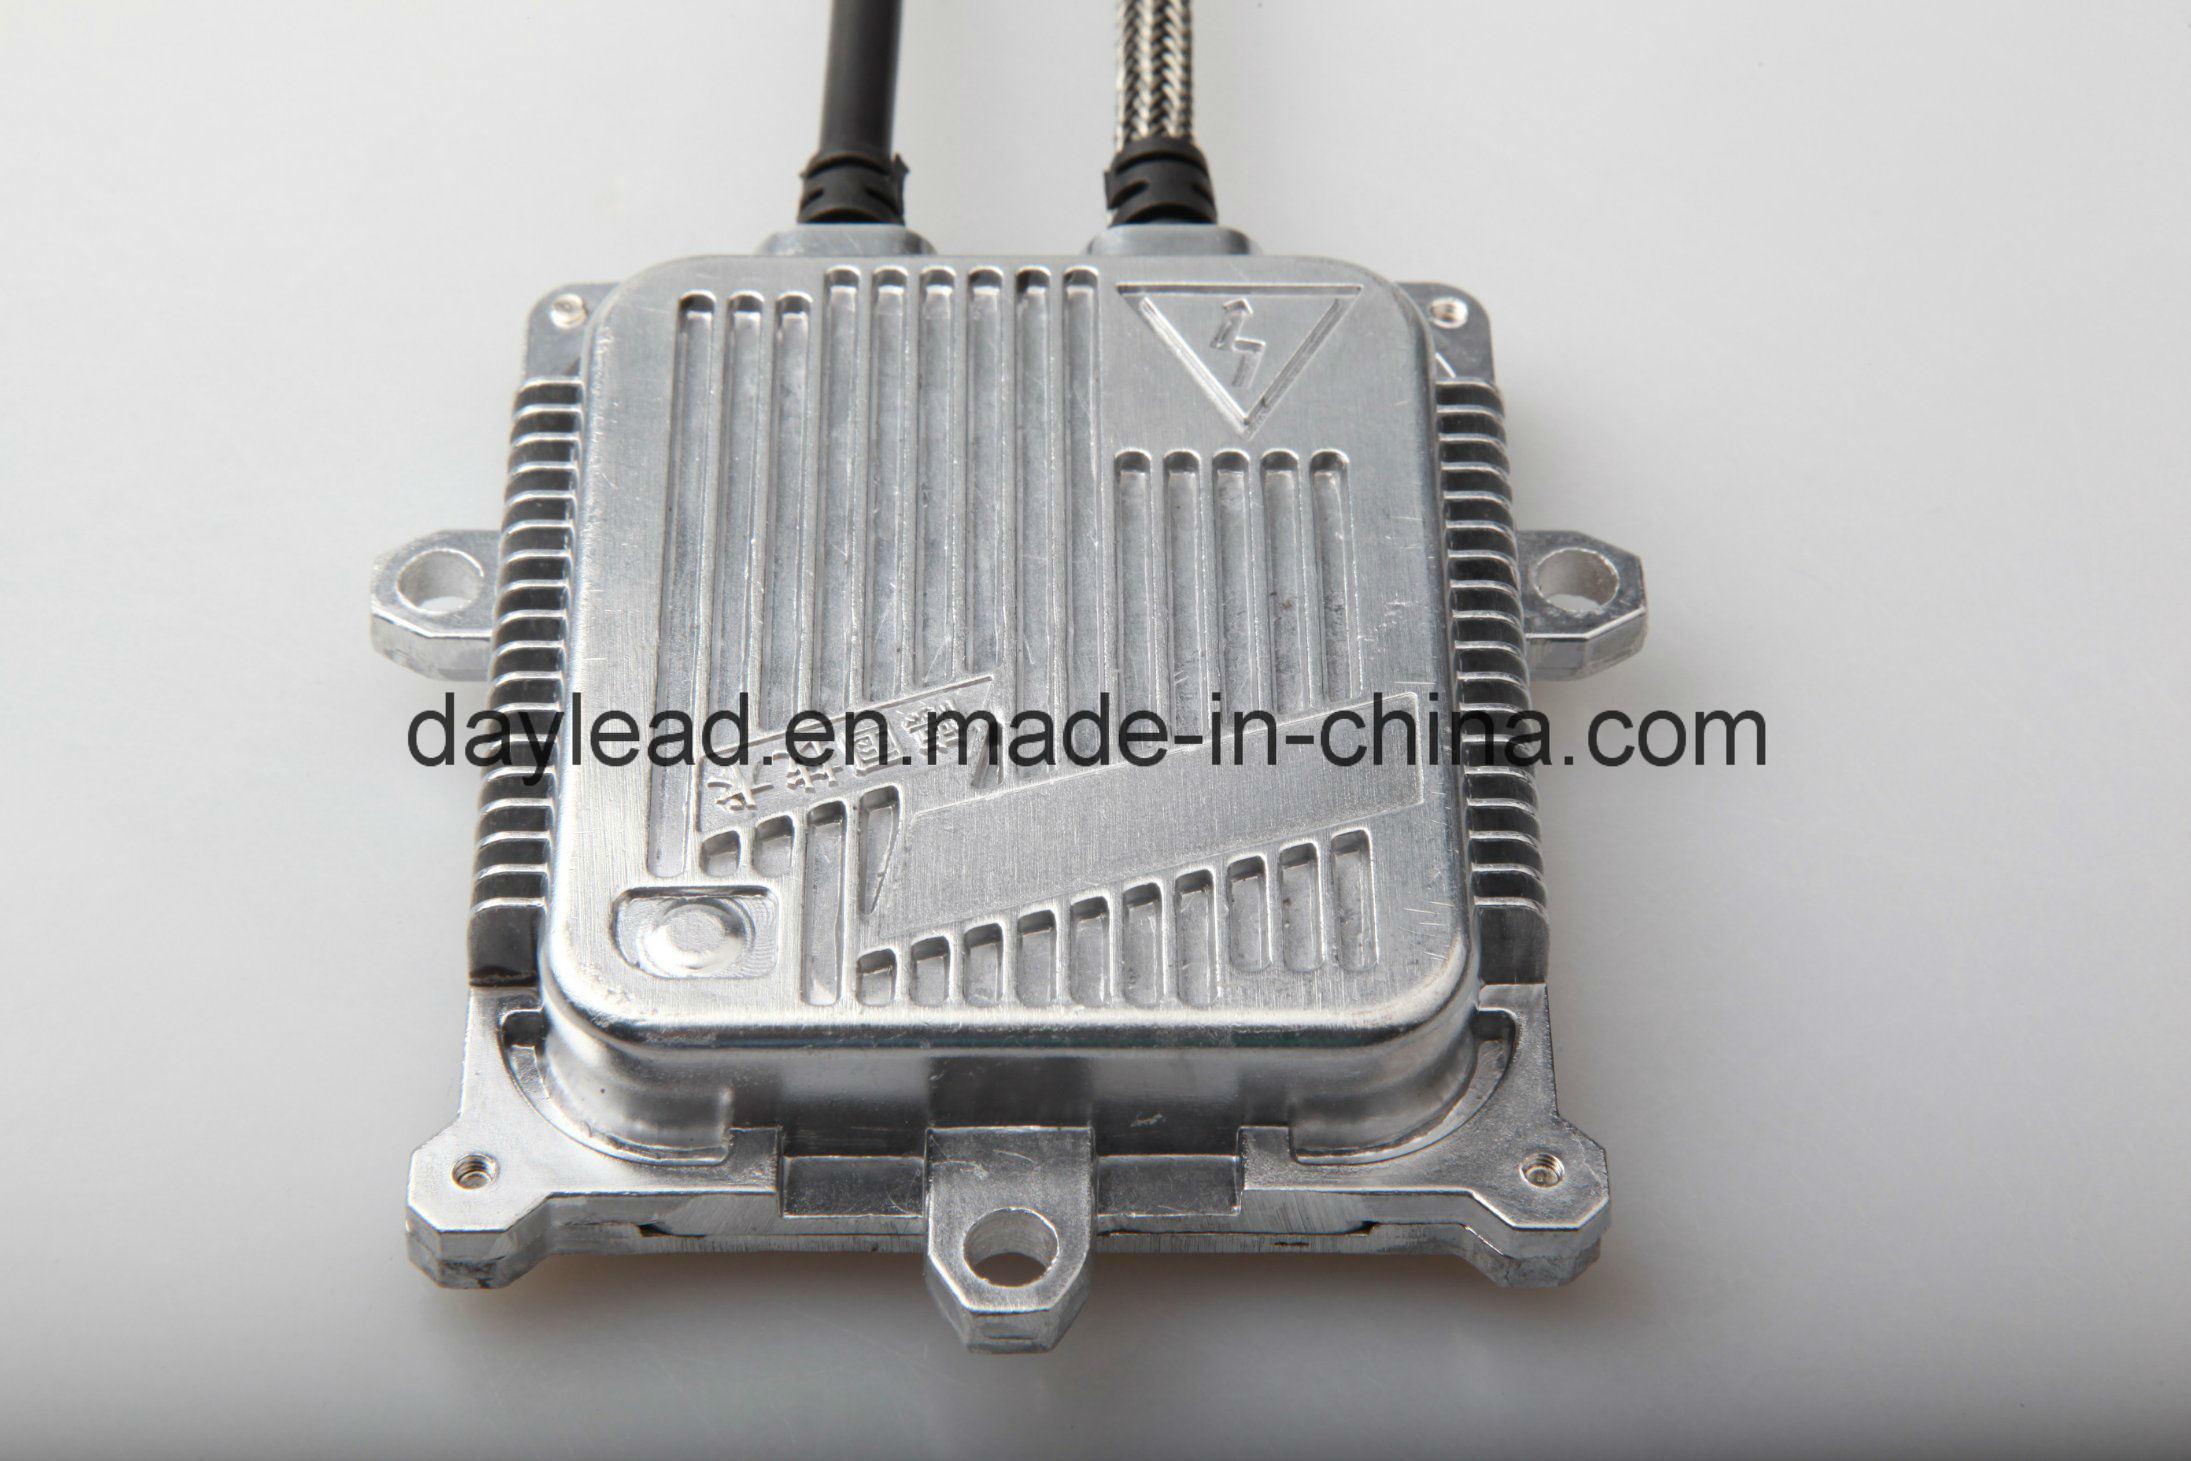 Big Power China Supply Xenon HID Ballast